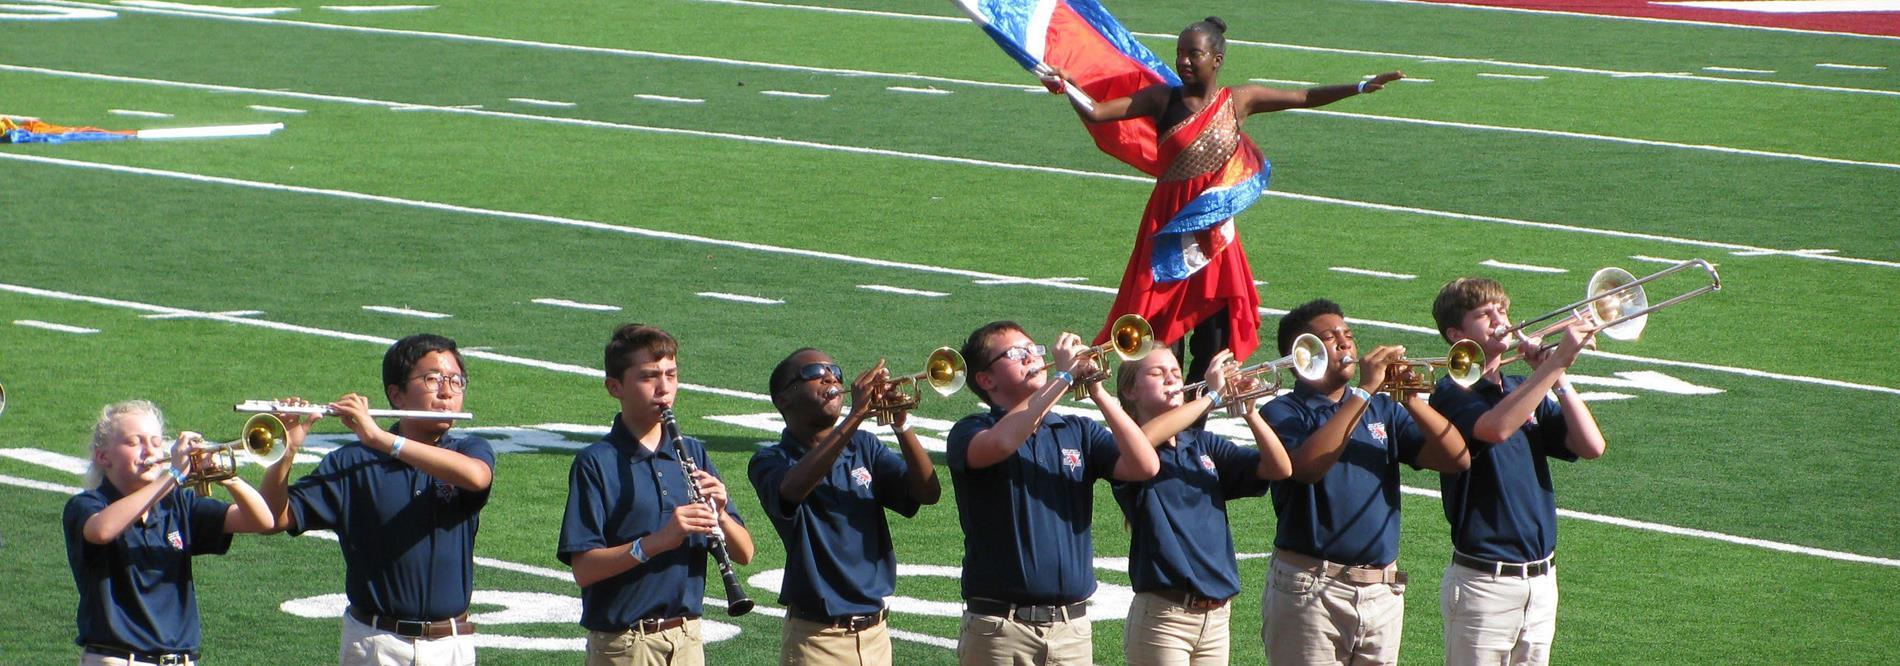 PRHS Band